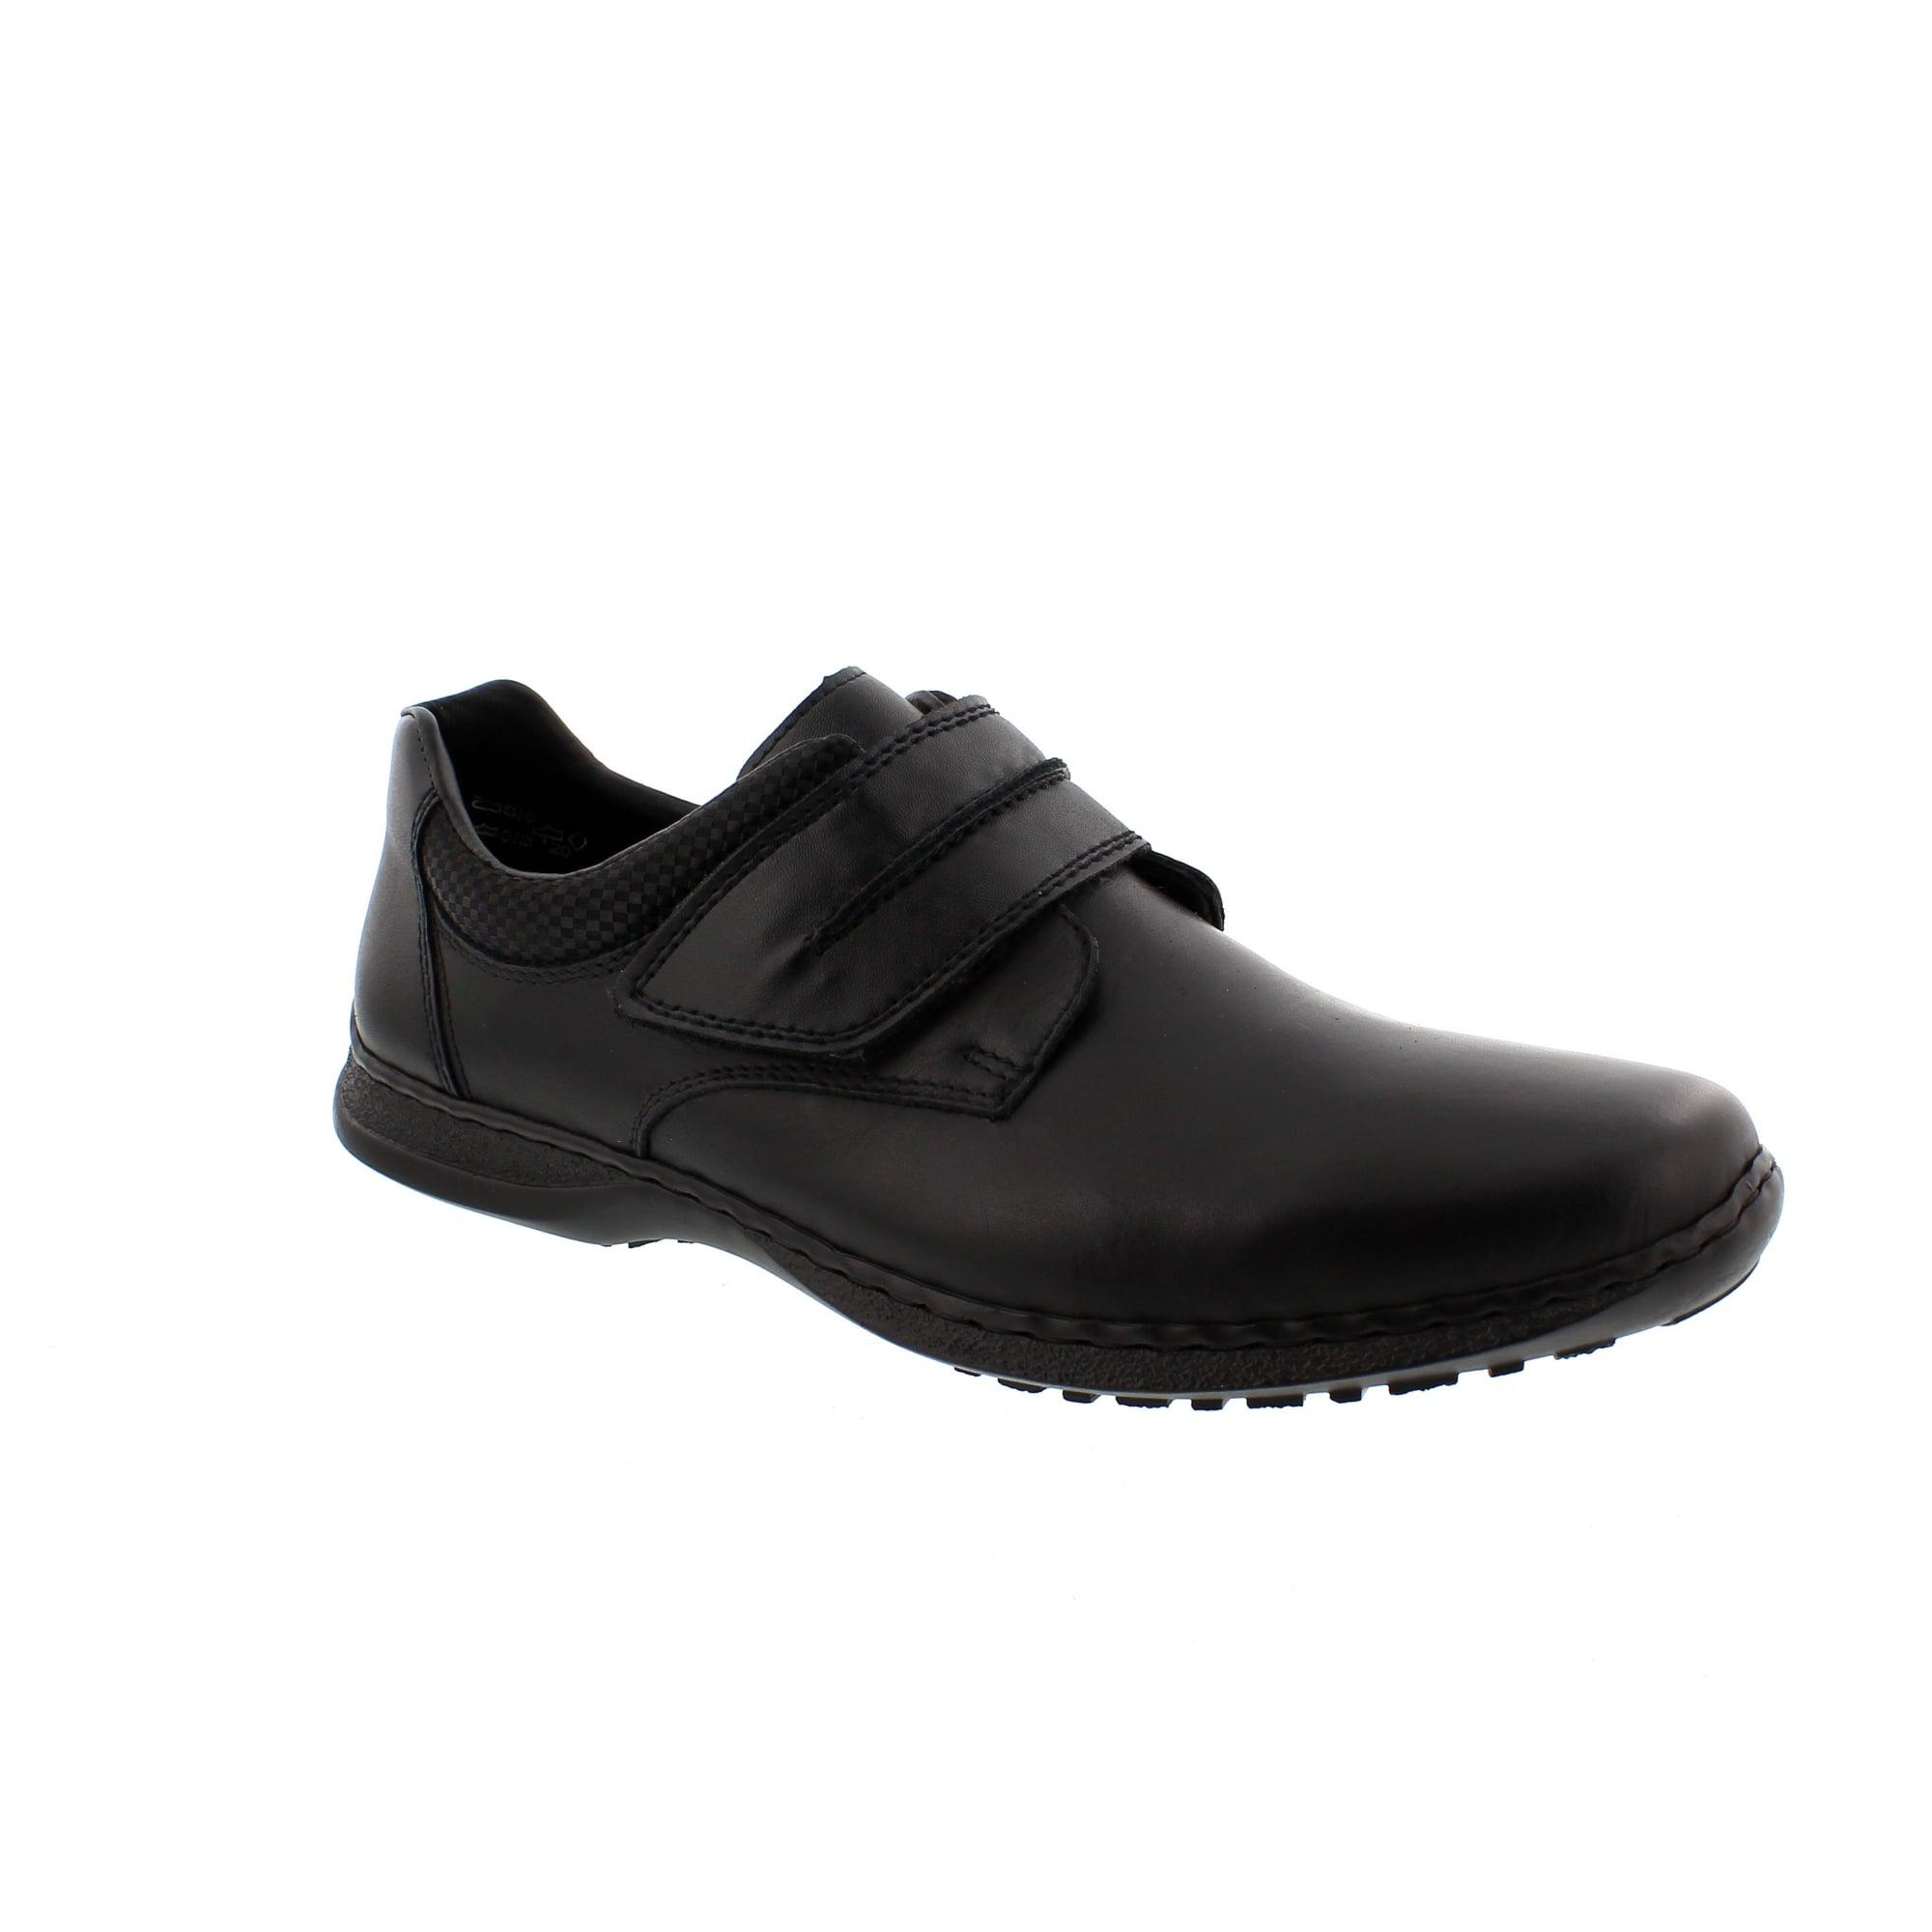 Rieker 04758-00 Black Leather Mens